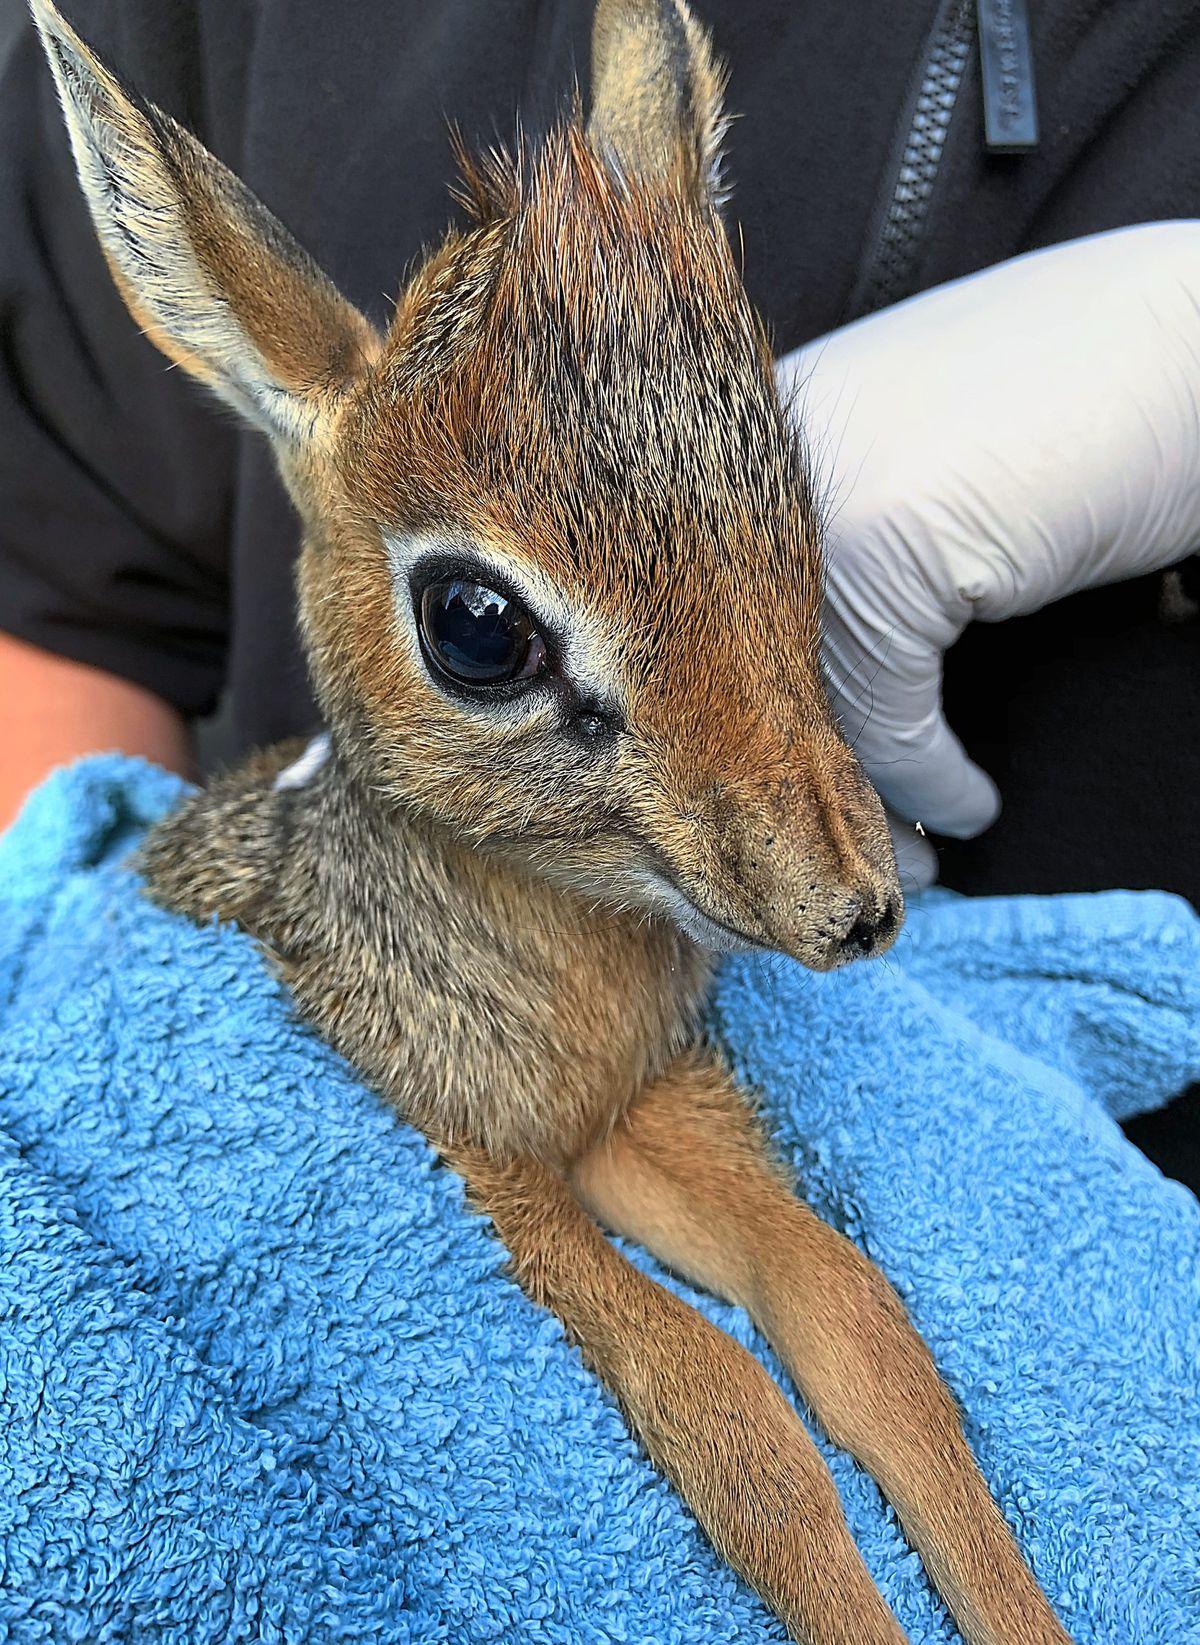 Twycross Zoo's newest arrival